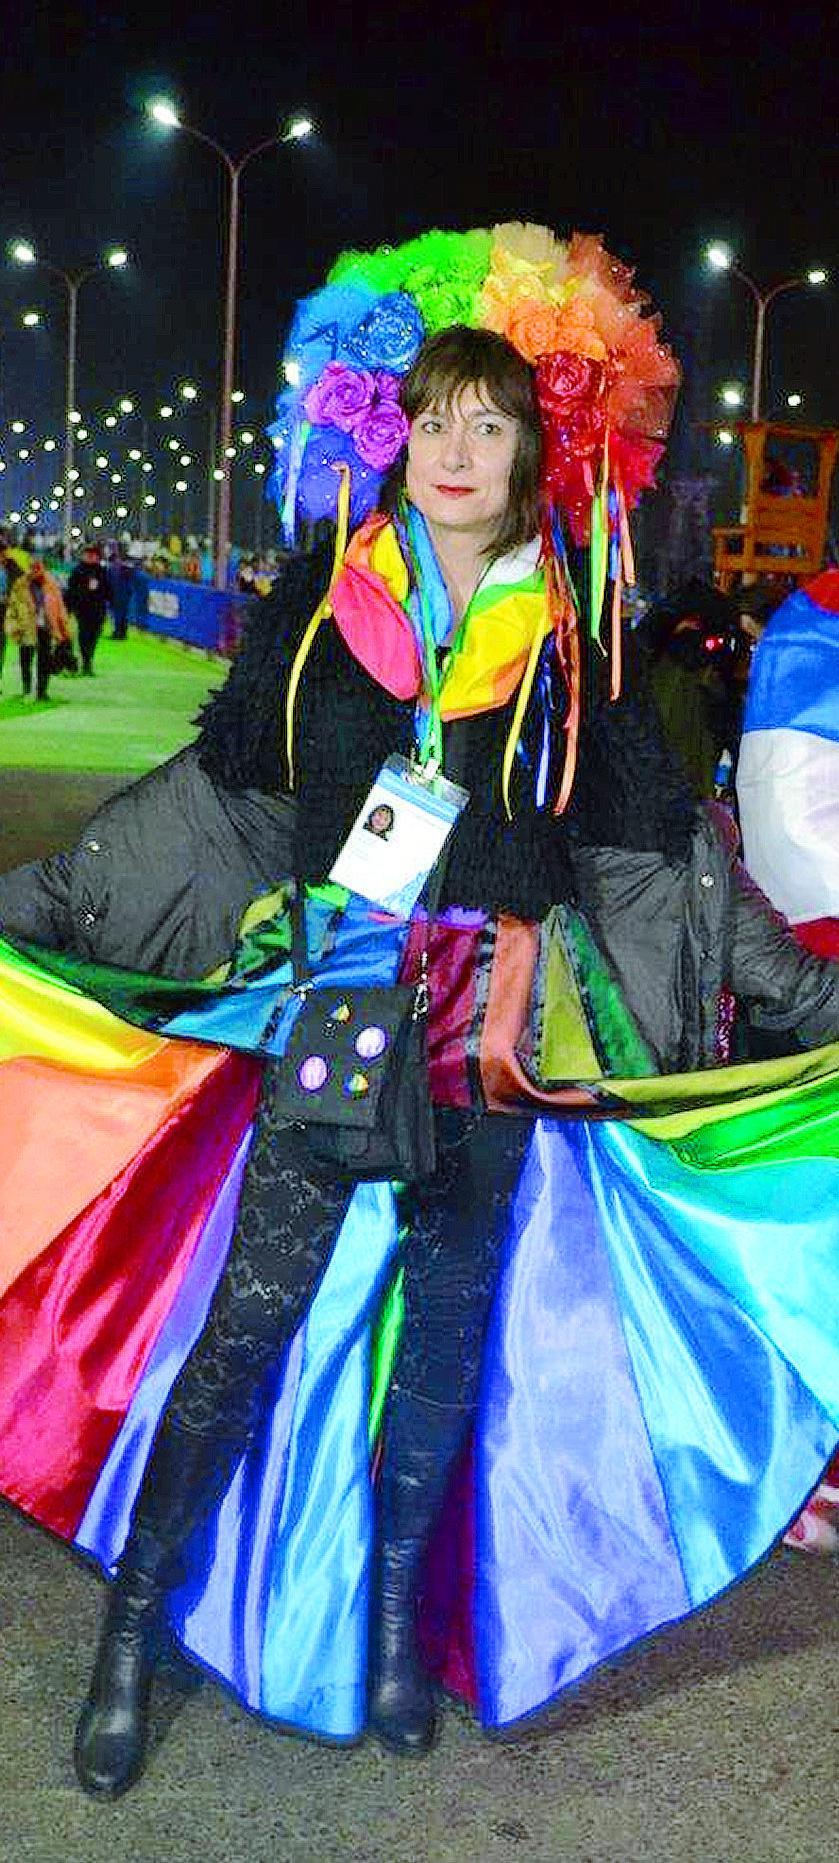 escort gay a palermo male escort sites